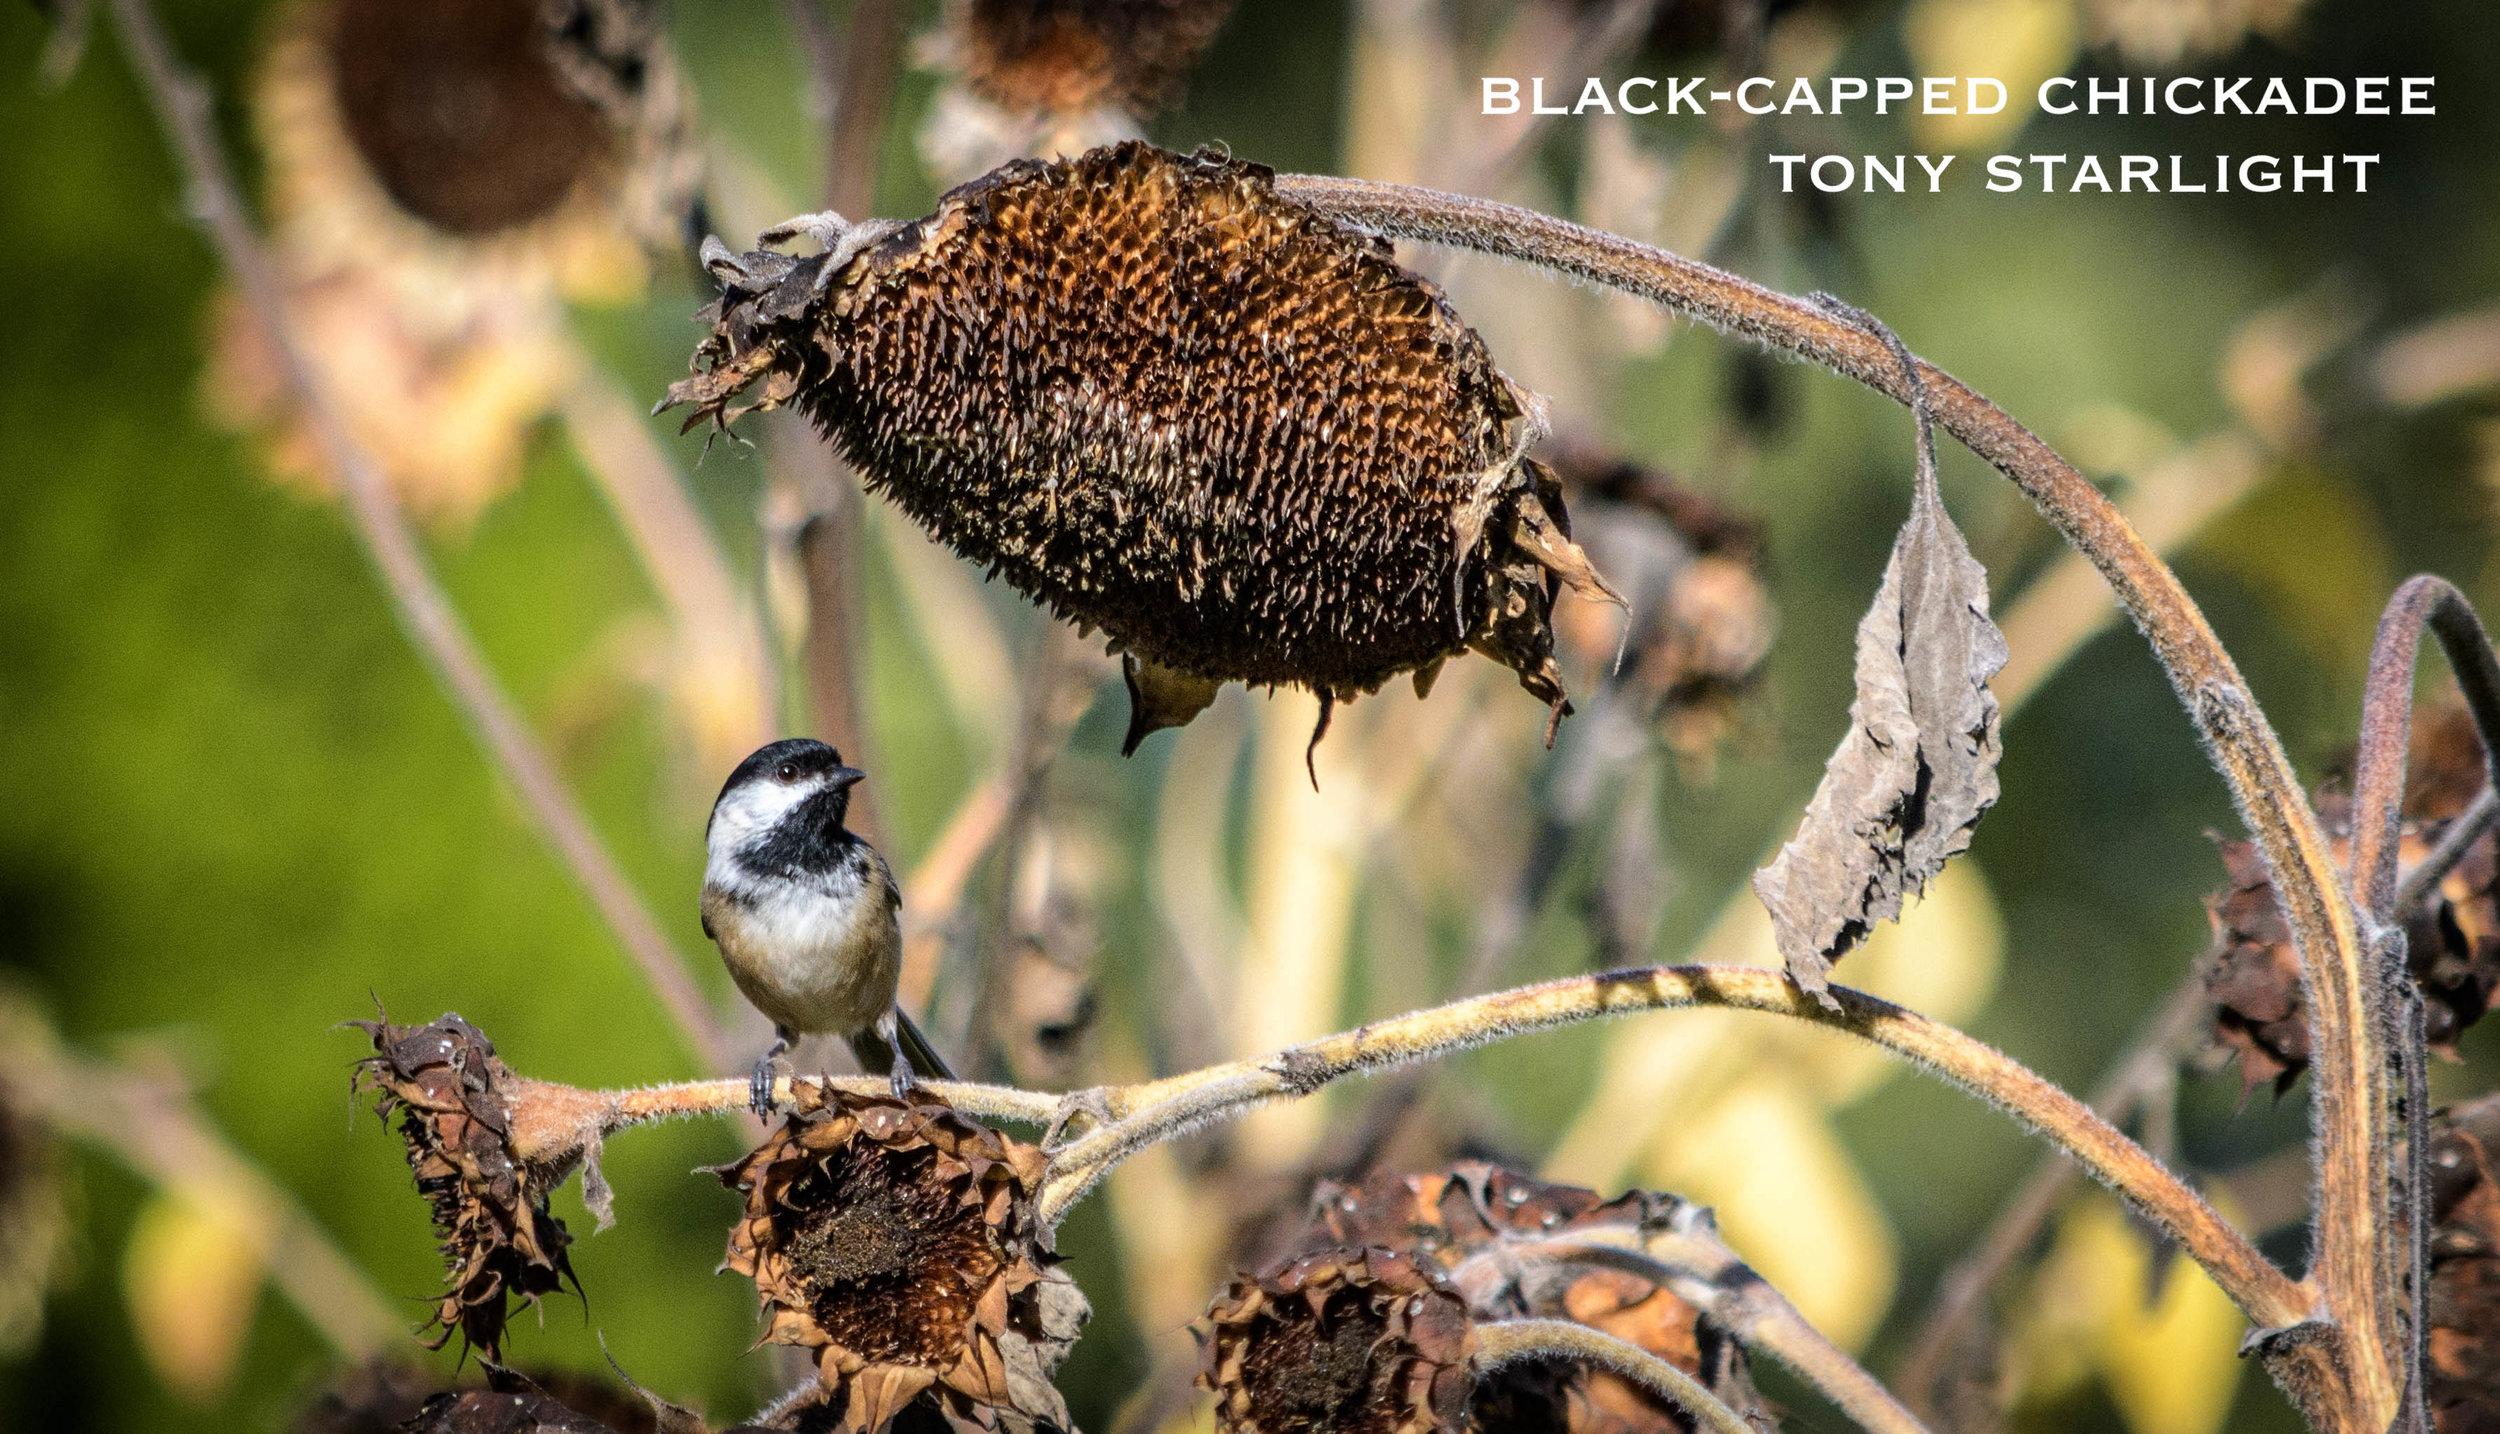 Black-capped Chickadee DSC_0271.jpg